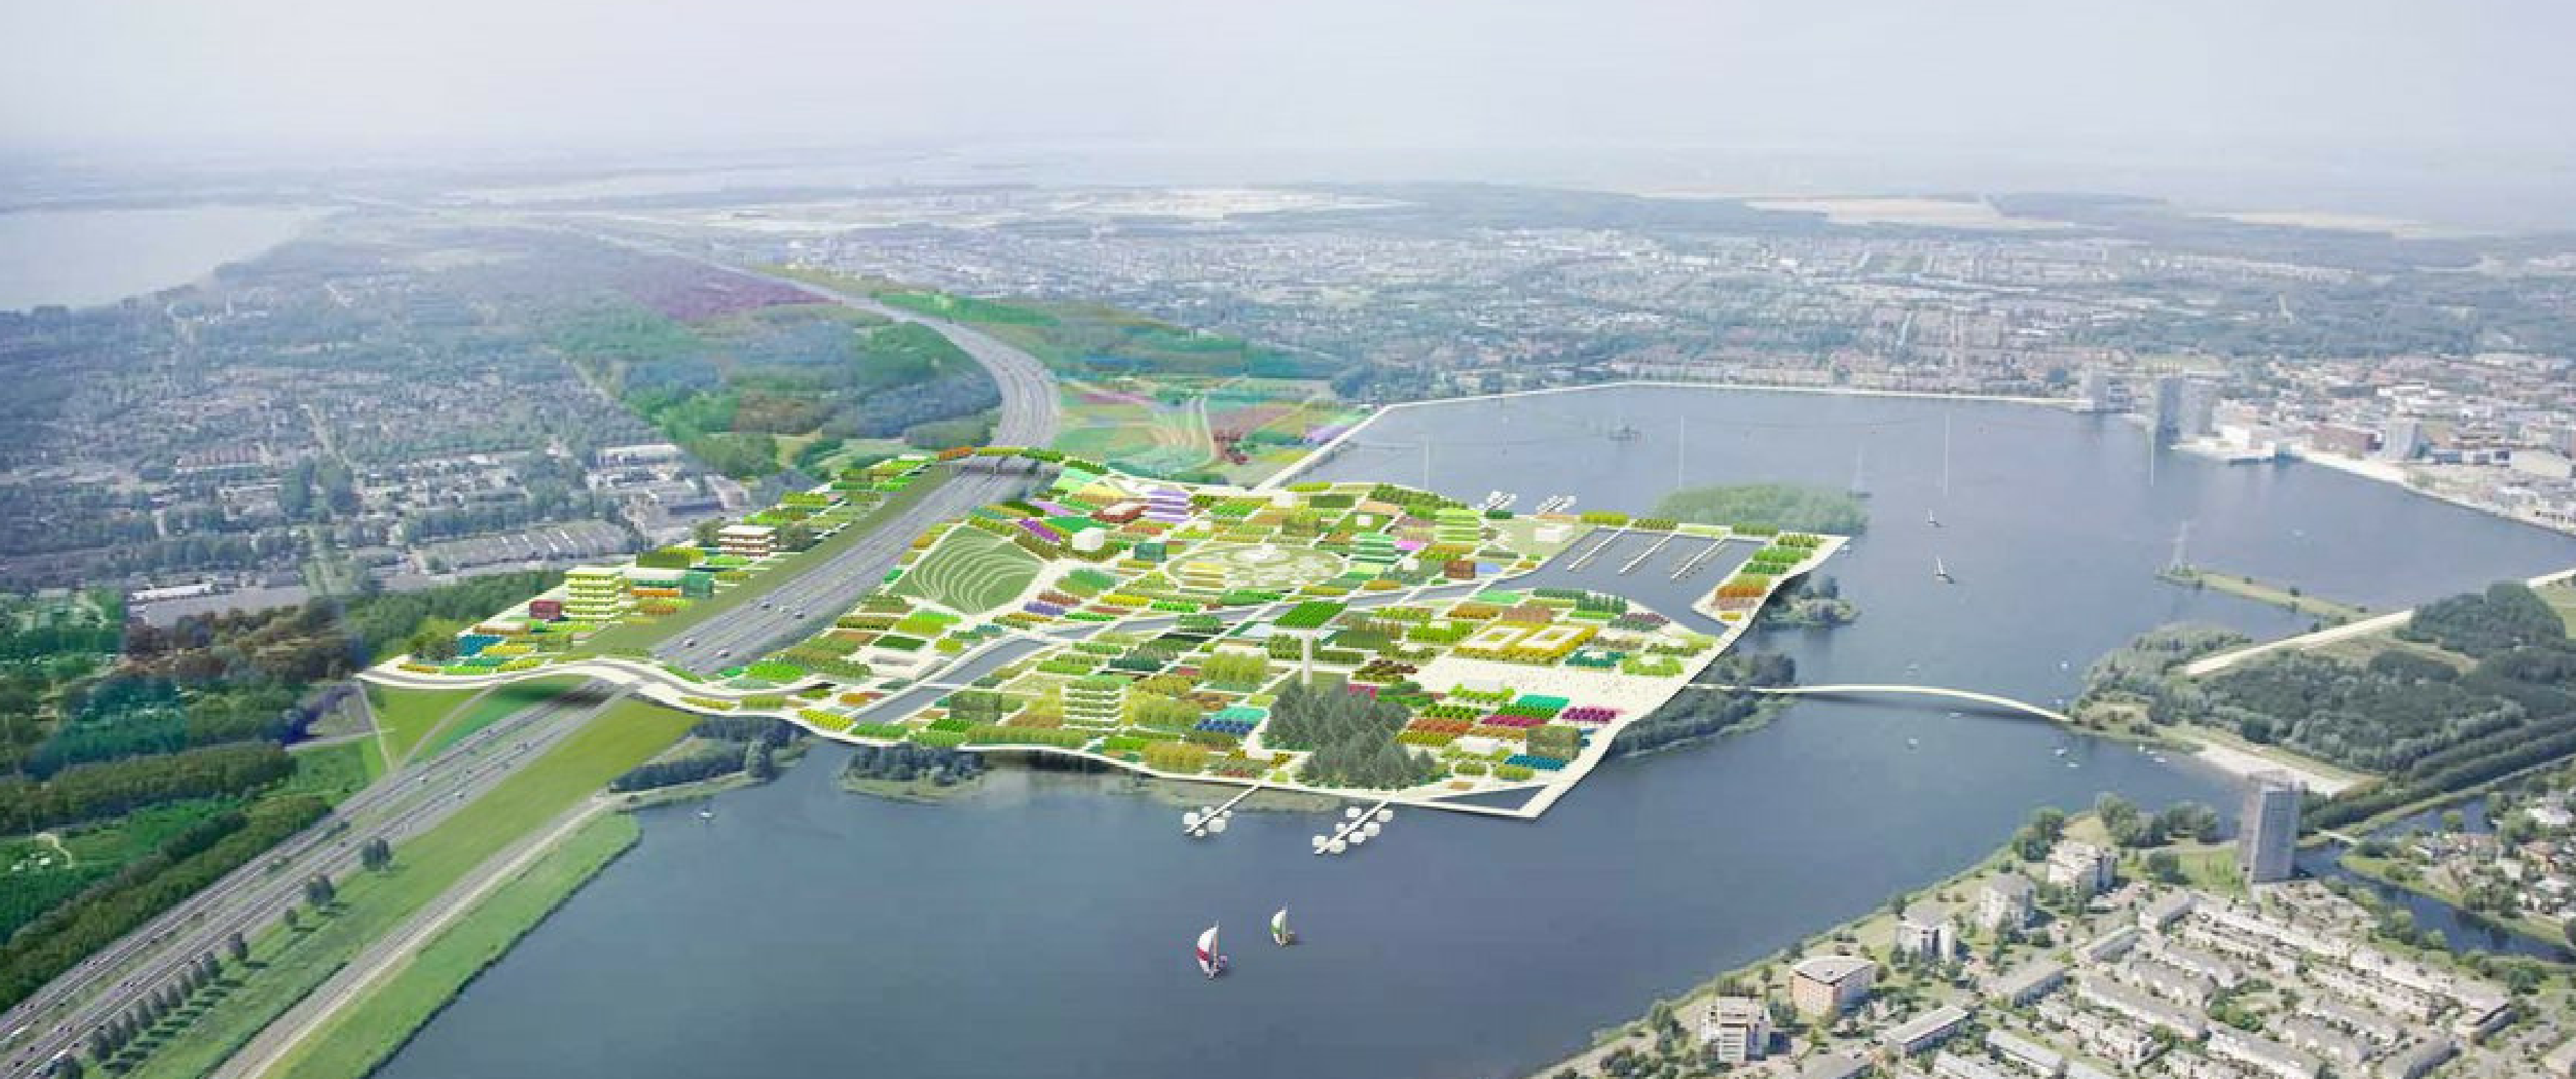 World Expo Floriade 2022 Amsterdam Almere